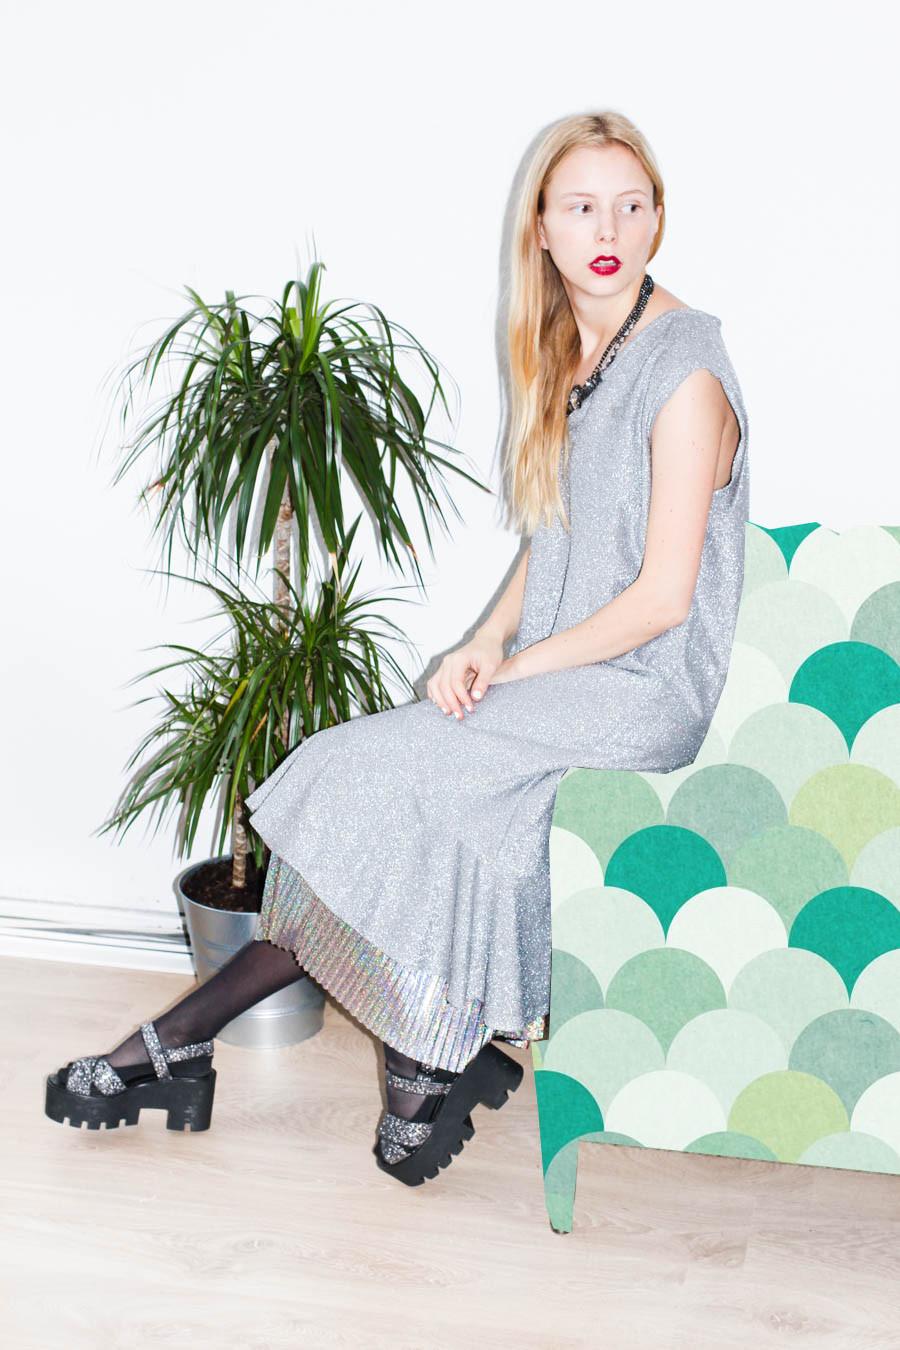 outfit December nemesis babe marie jensen danish blogger -1-3